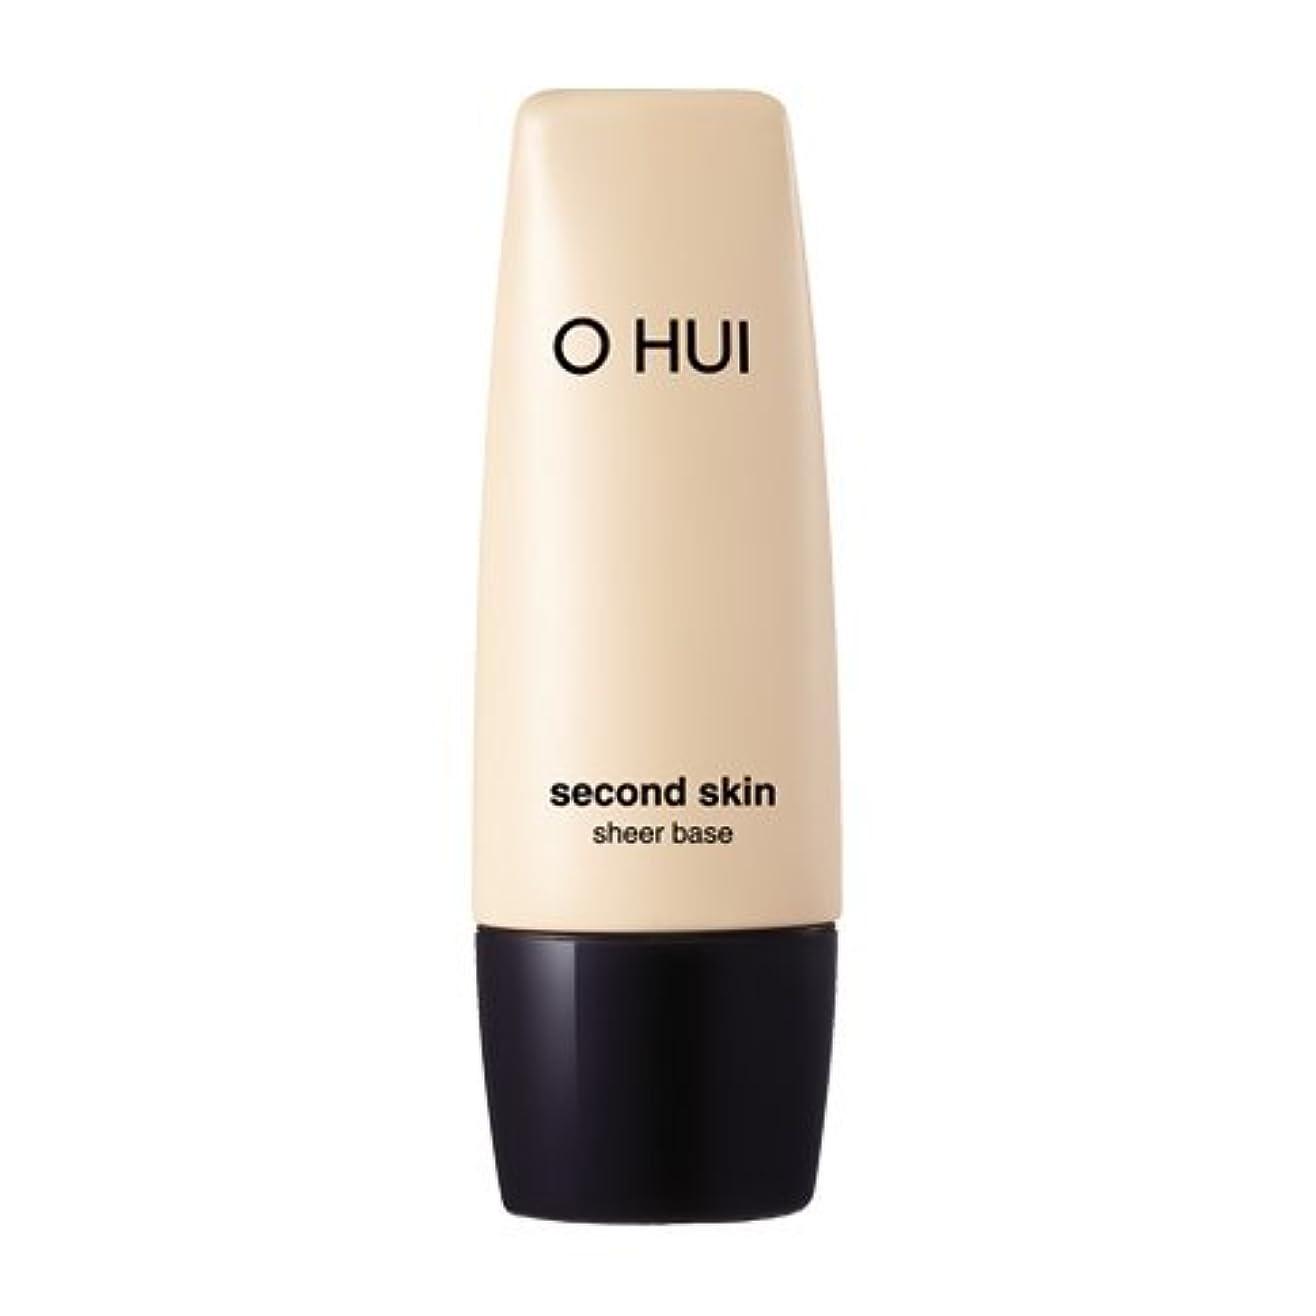 OHUI Second Skin Sheer Base 40ml/オフィ セカンド スキン シア ベース 40ml